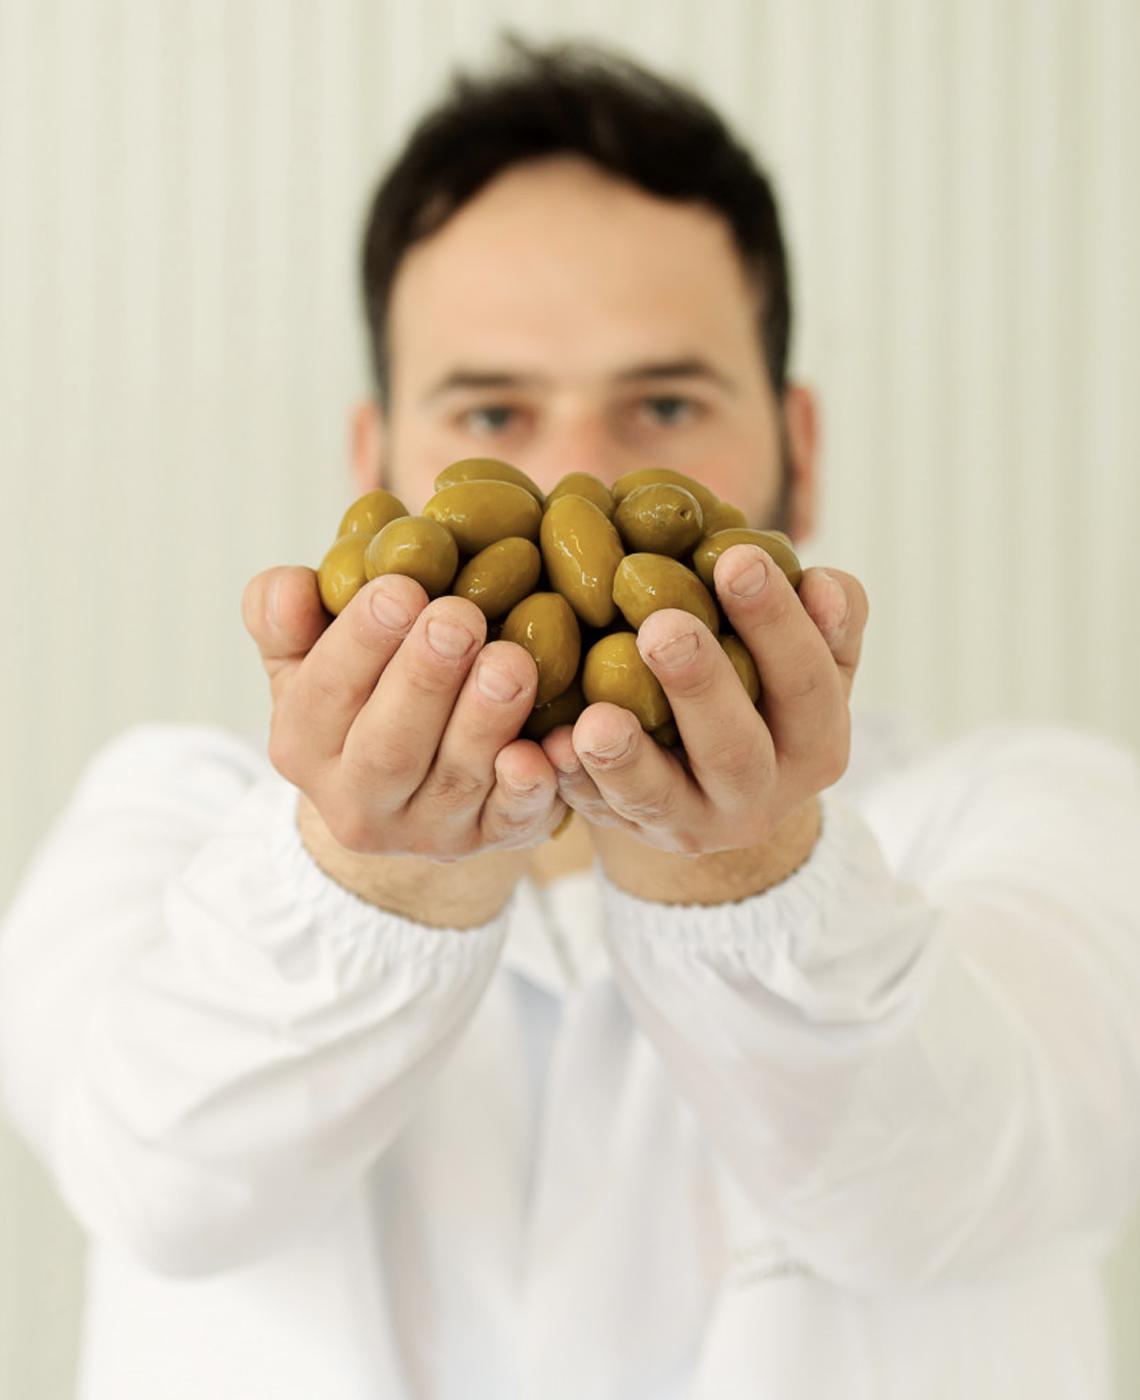 olive-belle-di-cerignola-antica-entoria-conserve-e-vini-biologici-di-puglia